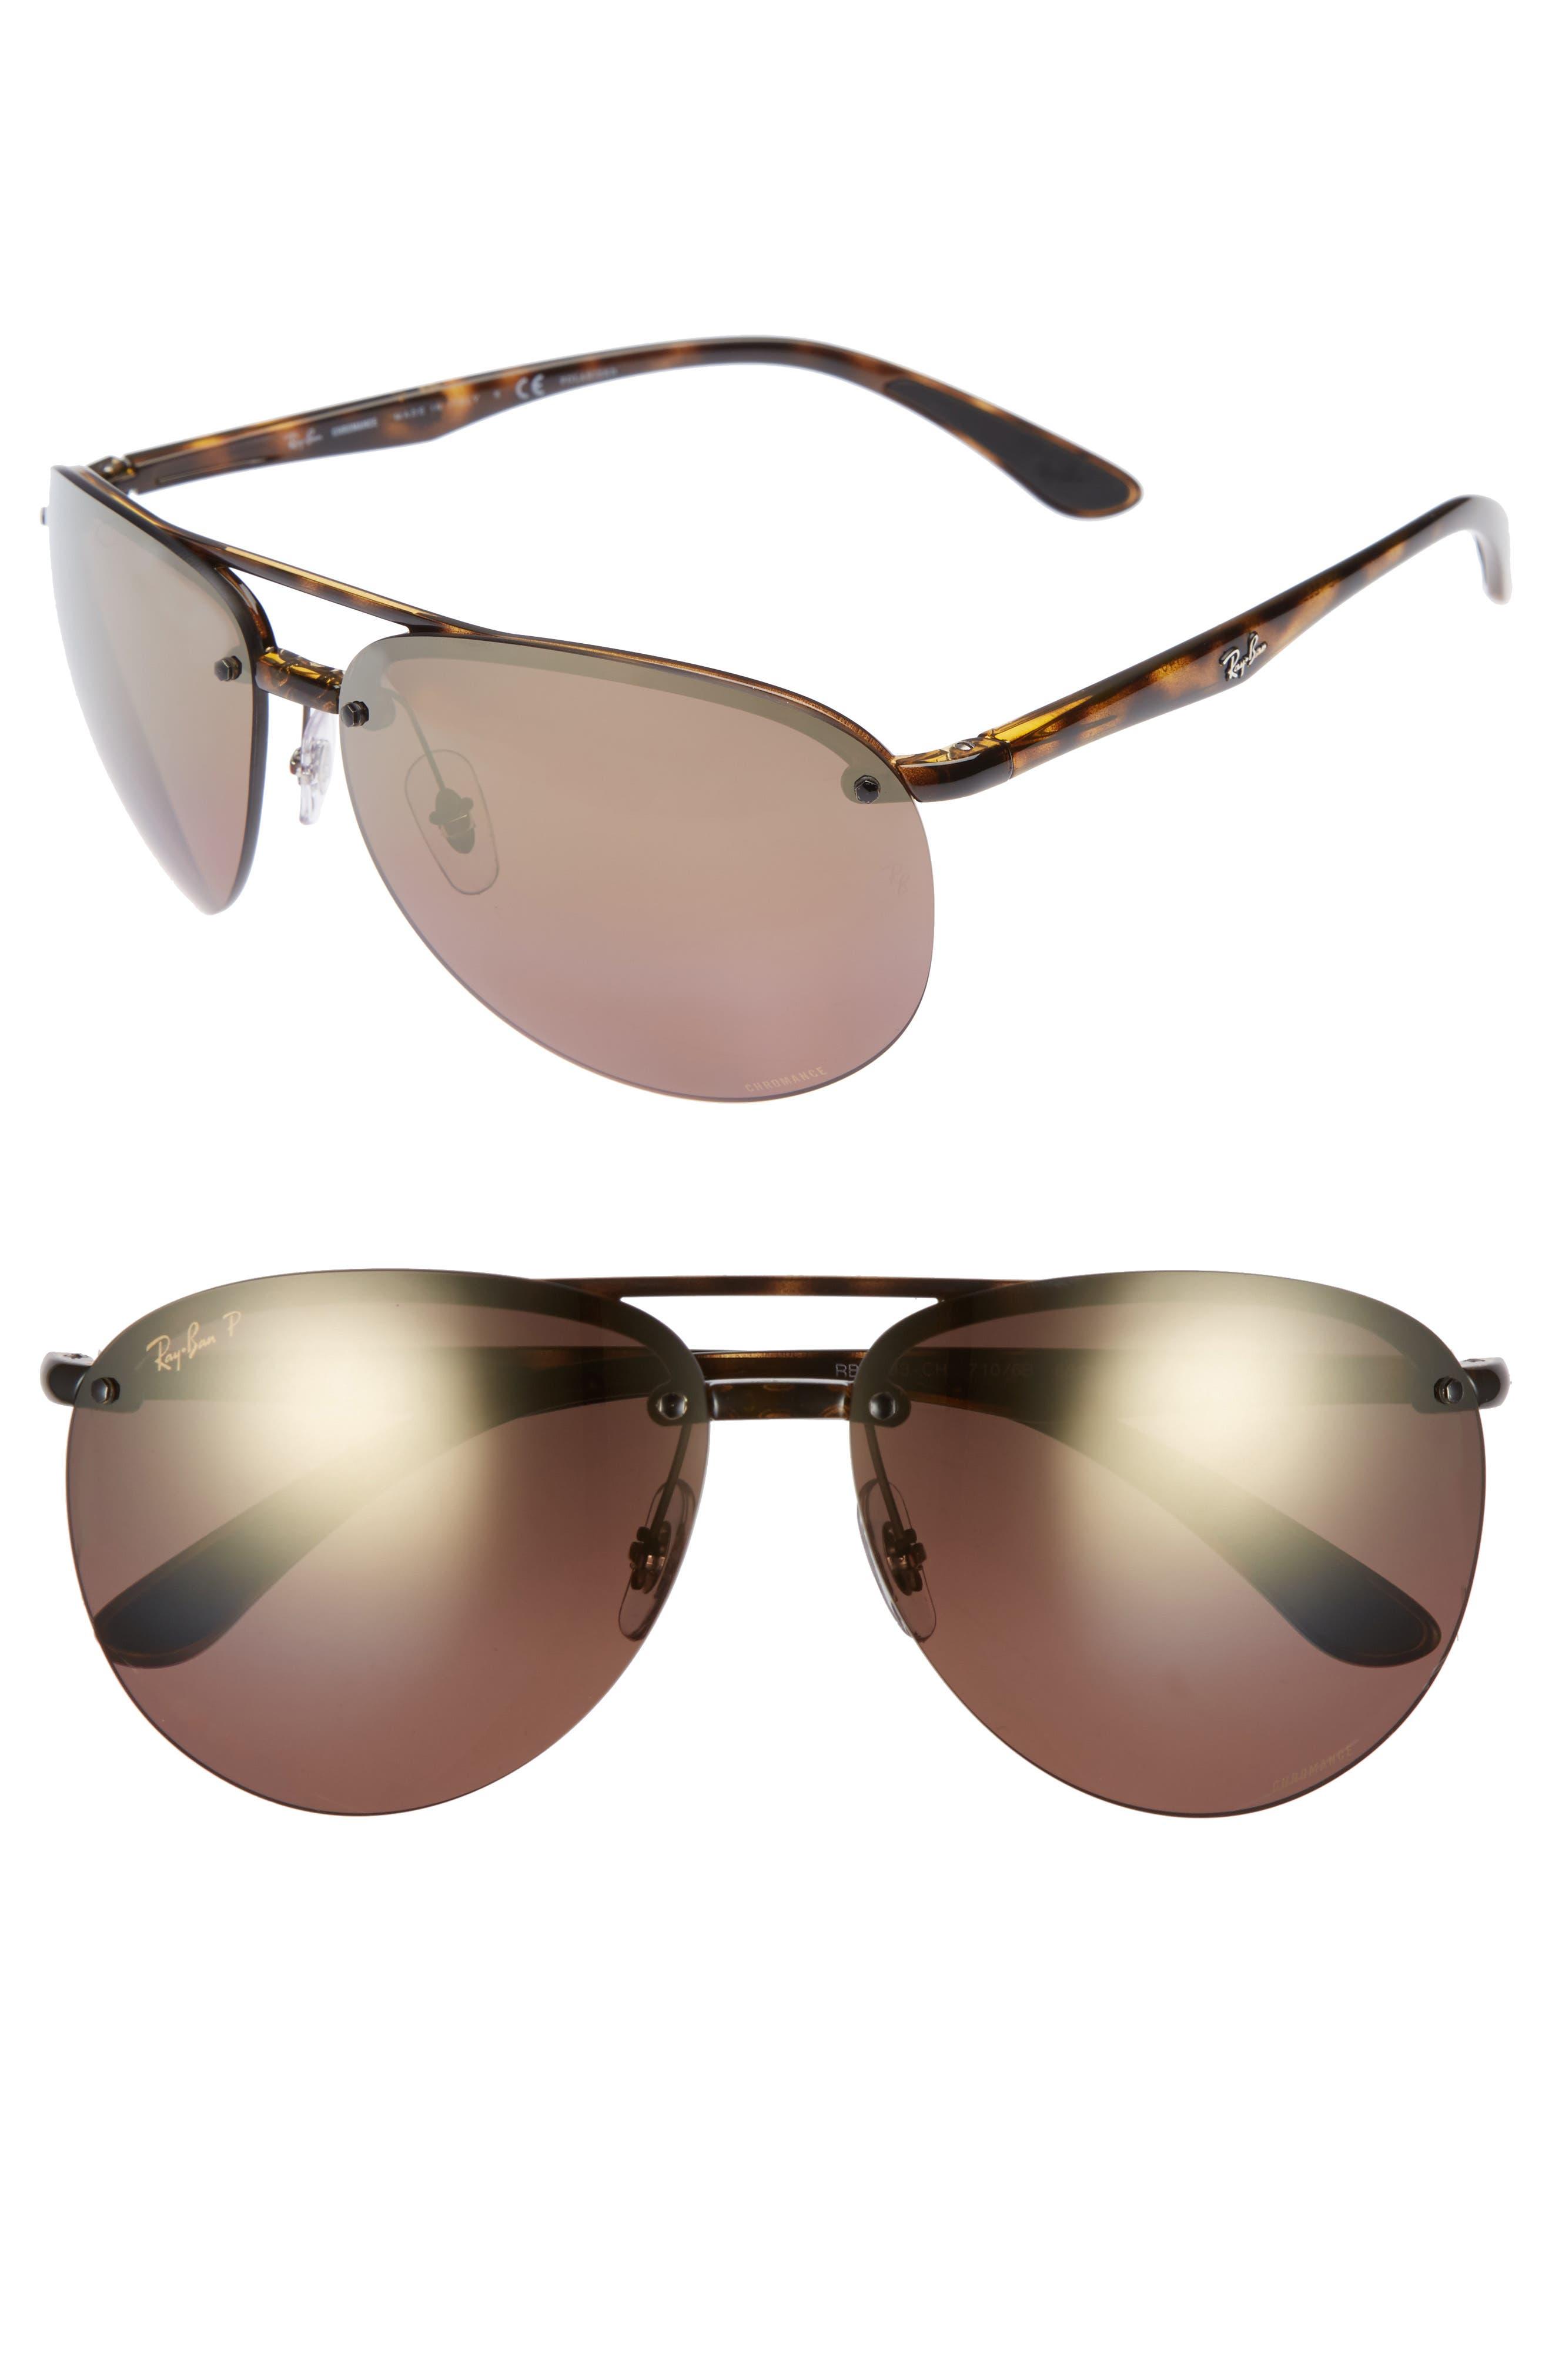 65mm Gradient Aviator Sunglasses,                         Main,                         color, 200